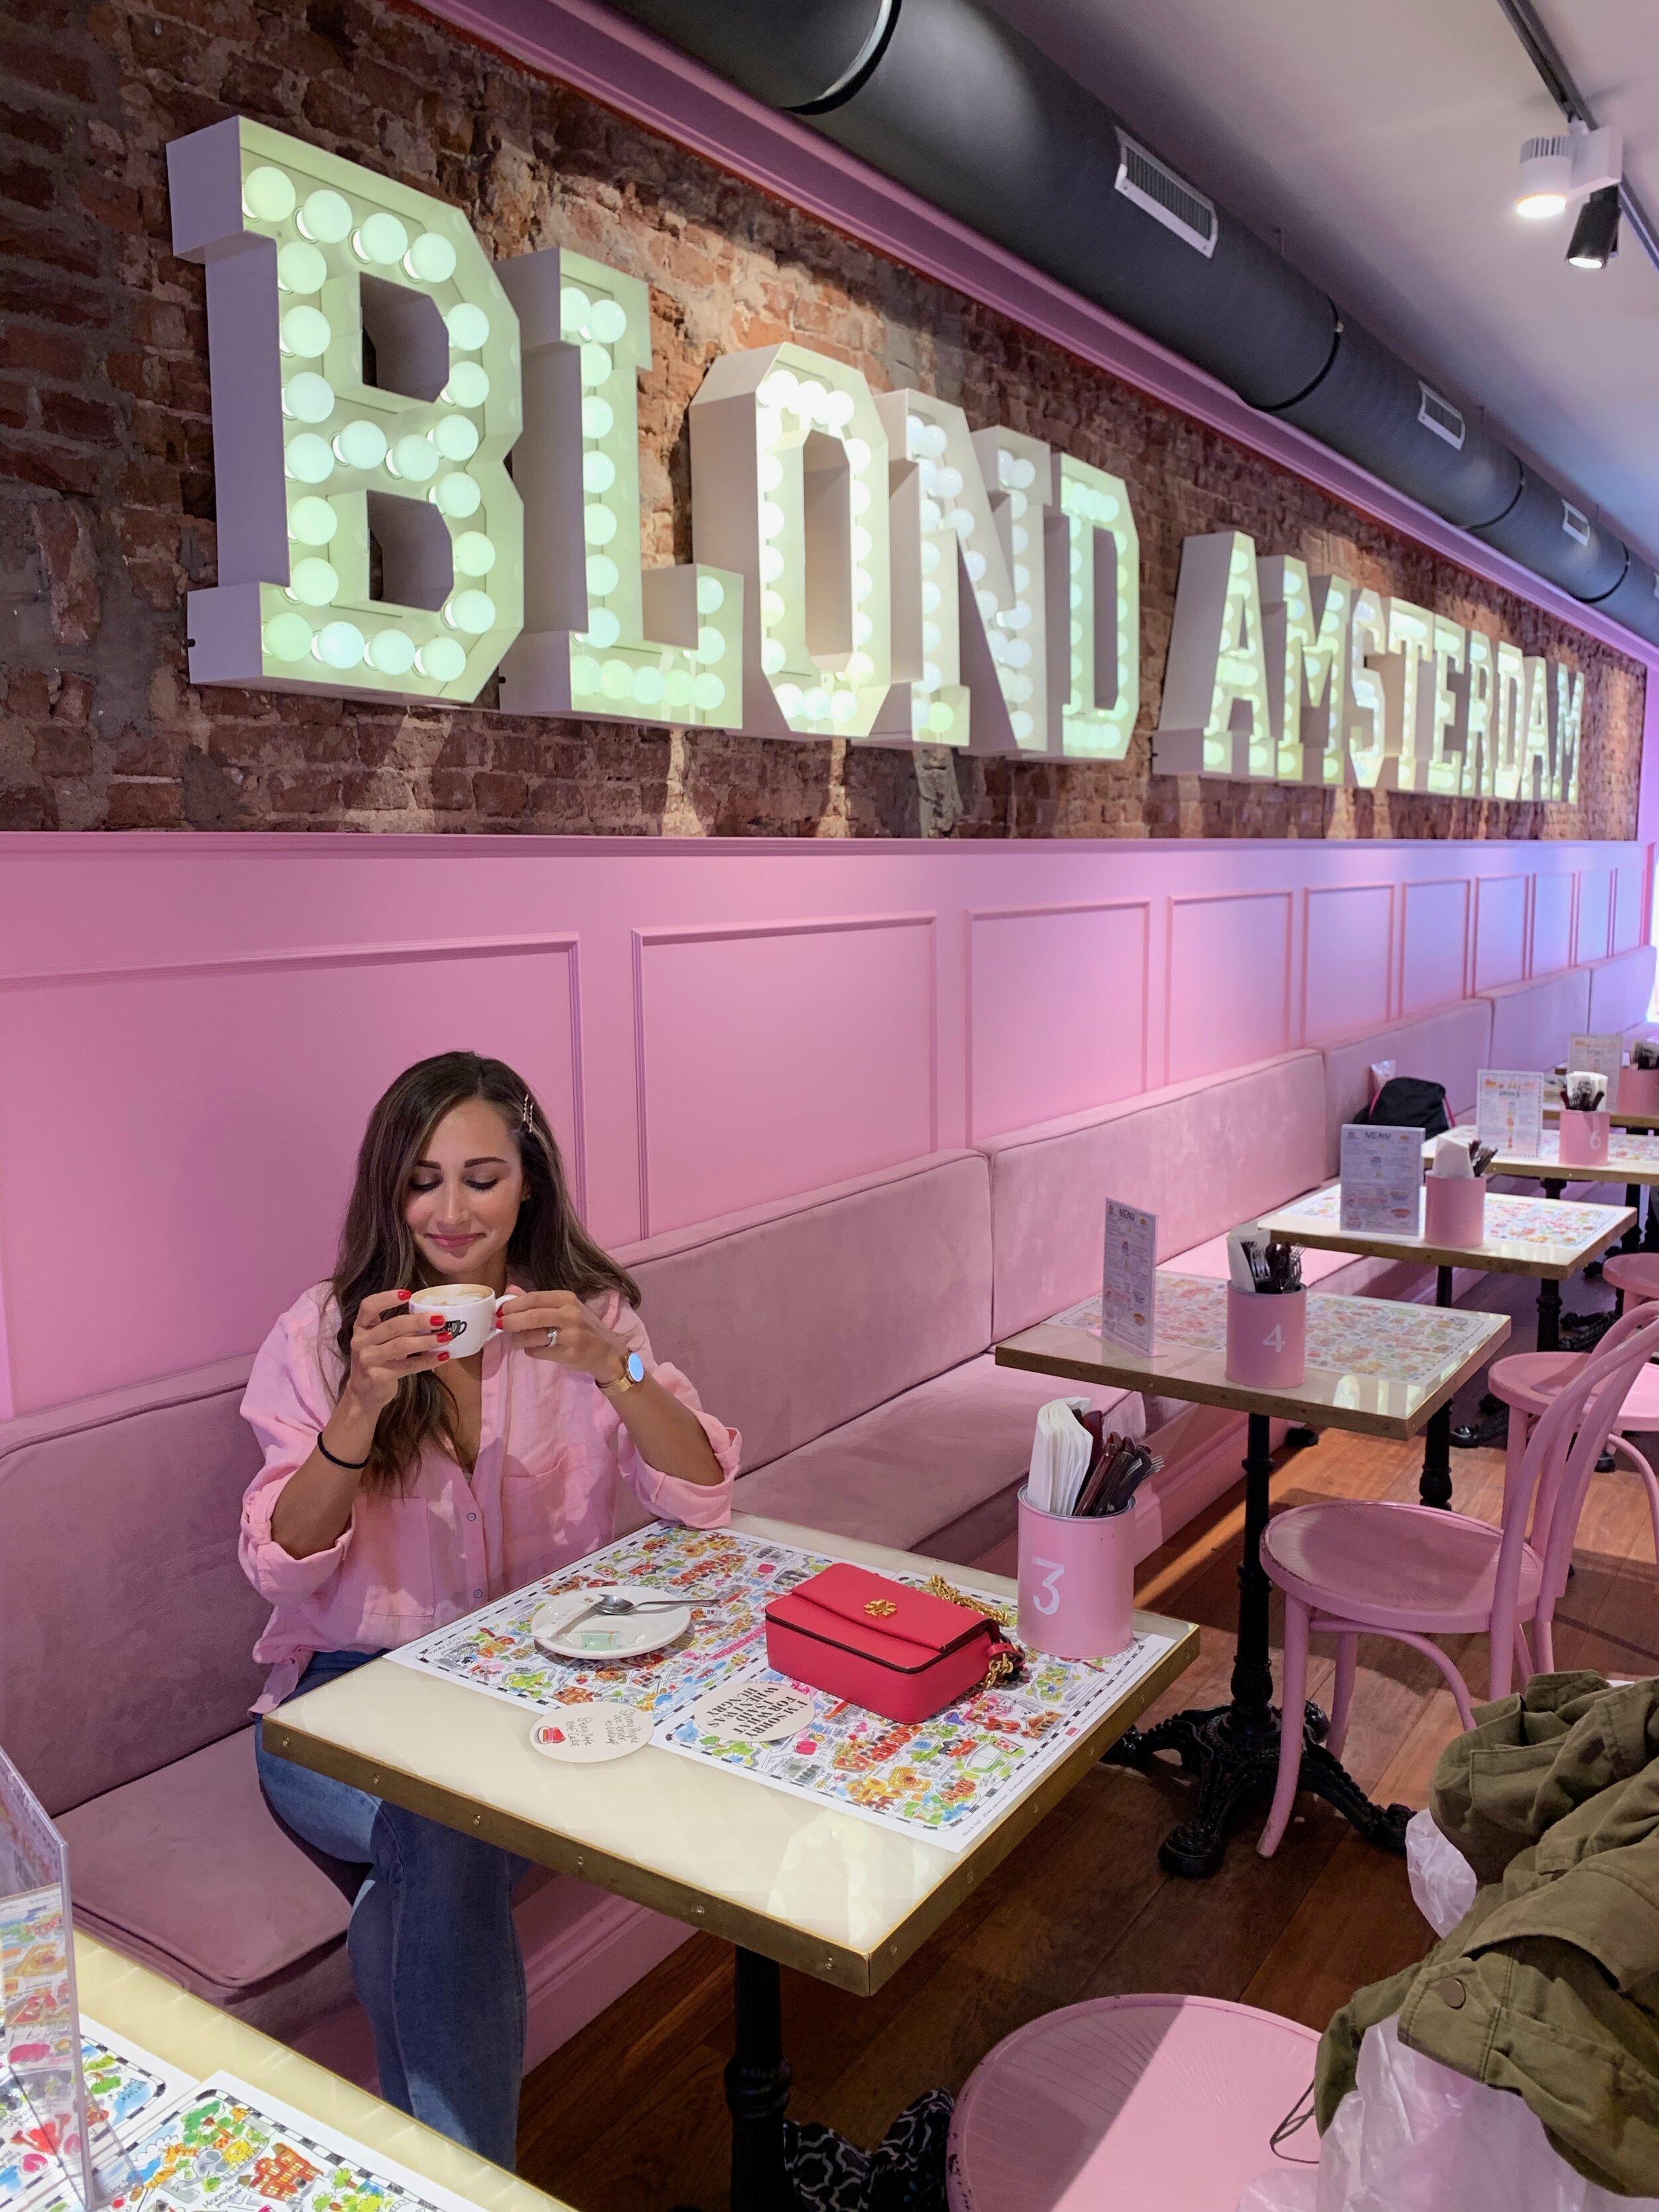 De Pijp Cafe - Blond Amsterdam